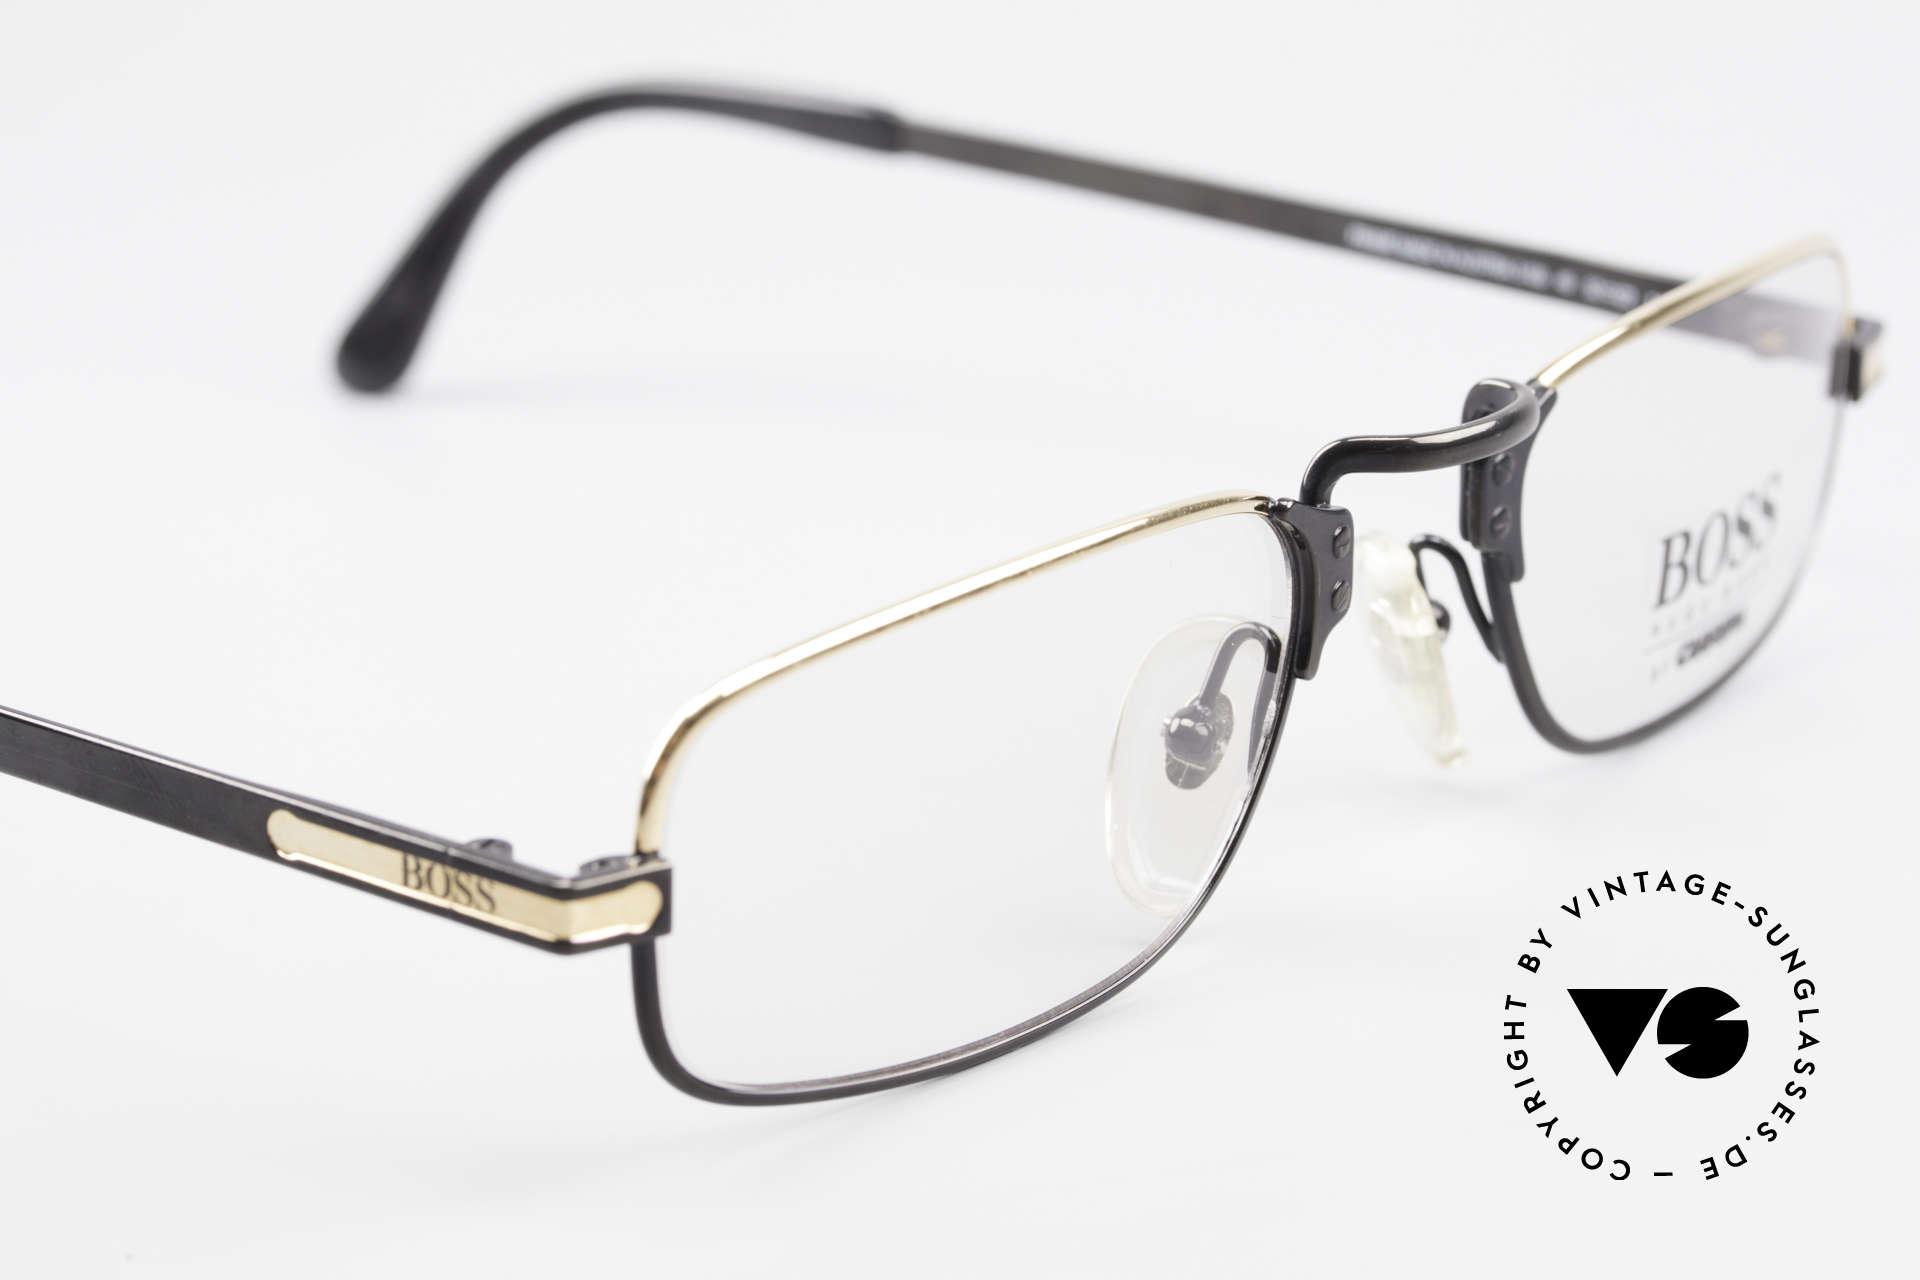 BOSS 5100 Classic Men's Reading Glasses, NO RETRO eyewear, but a brilliant BOSS ORIGINAL, Made for Men